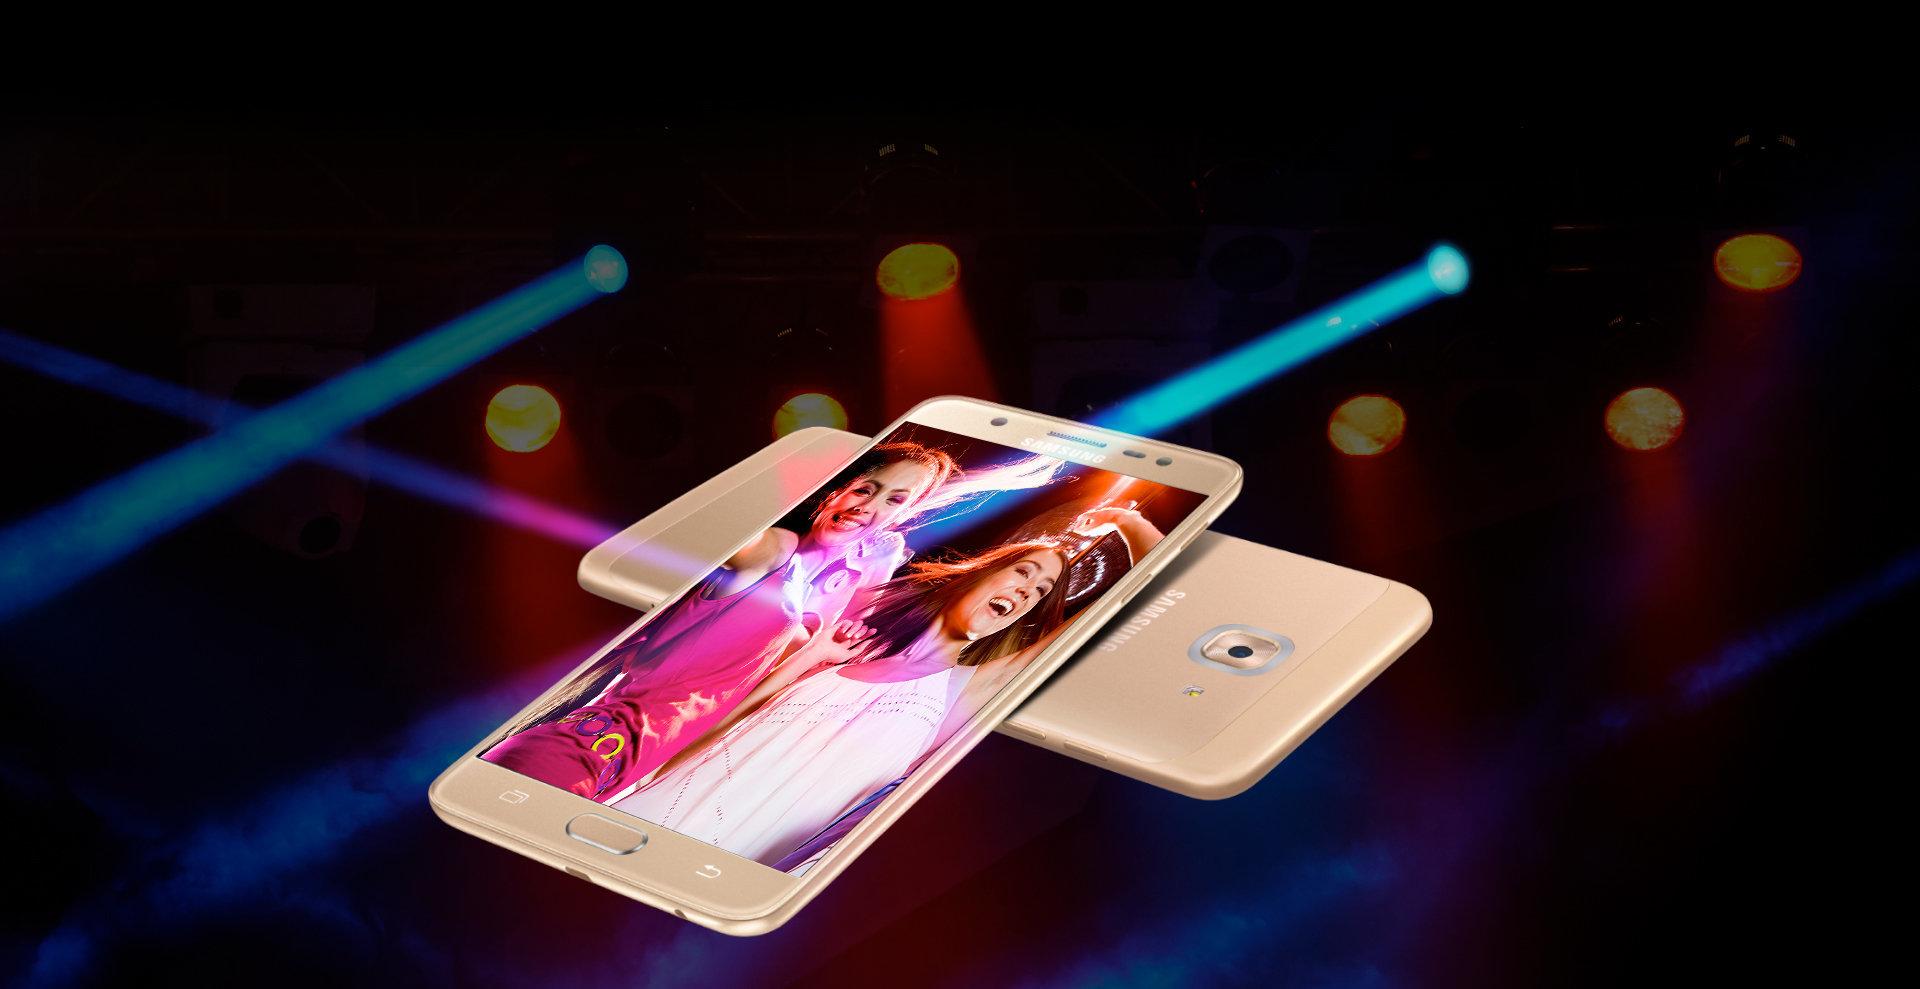 Samsung Galaxy J7 Max Specs & Features